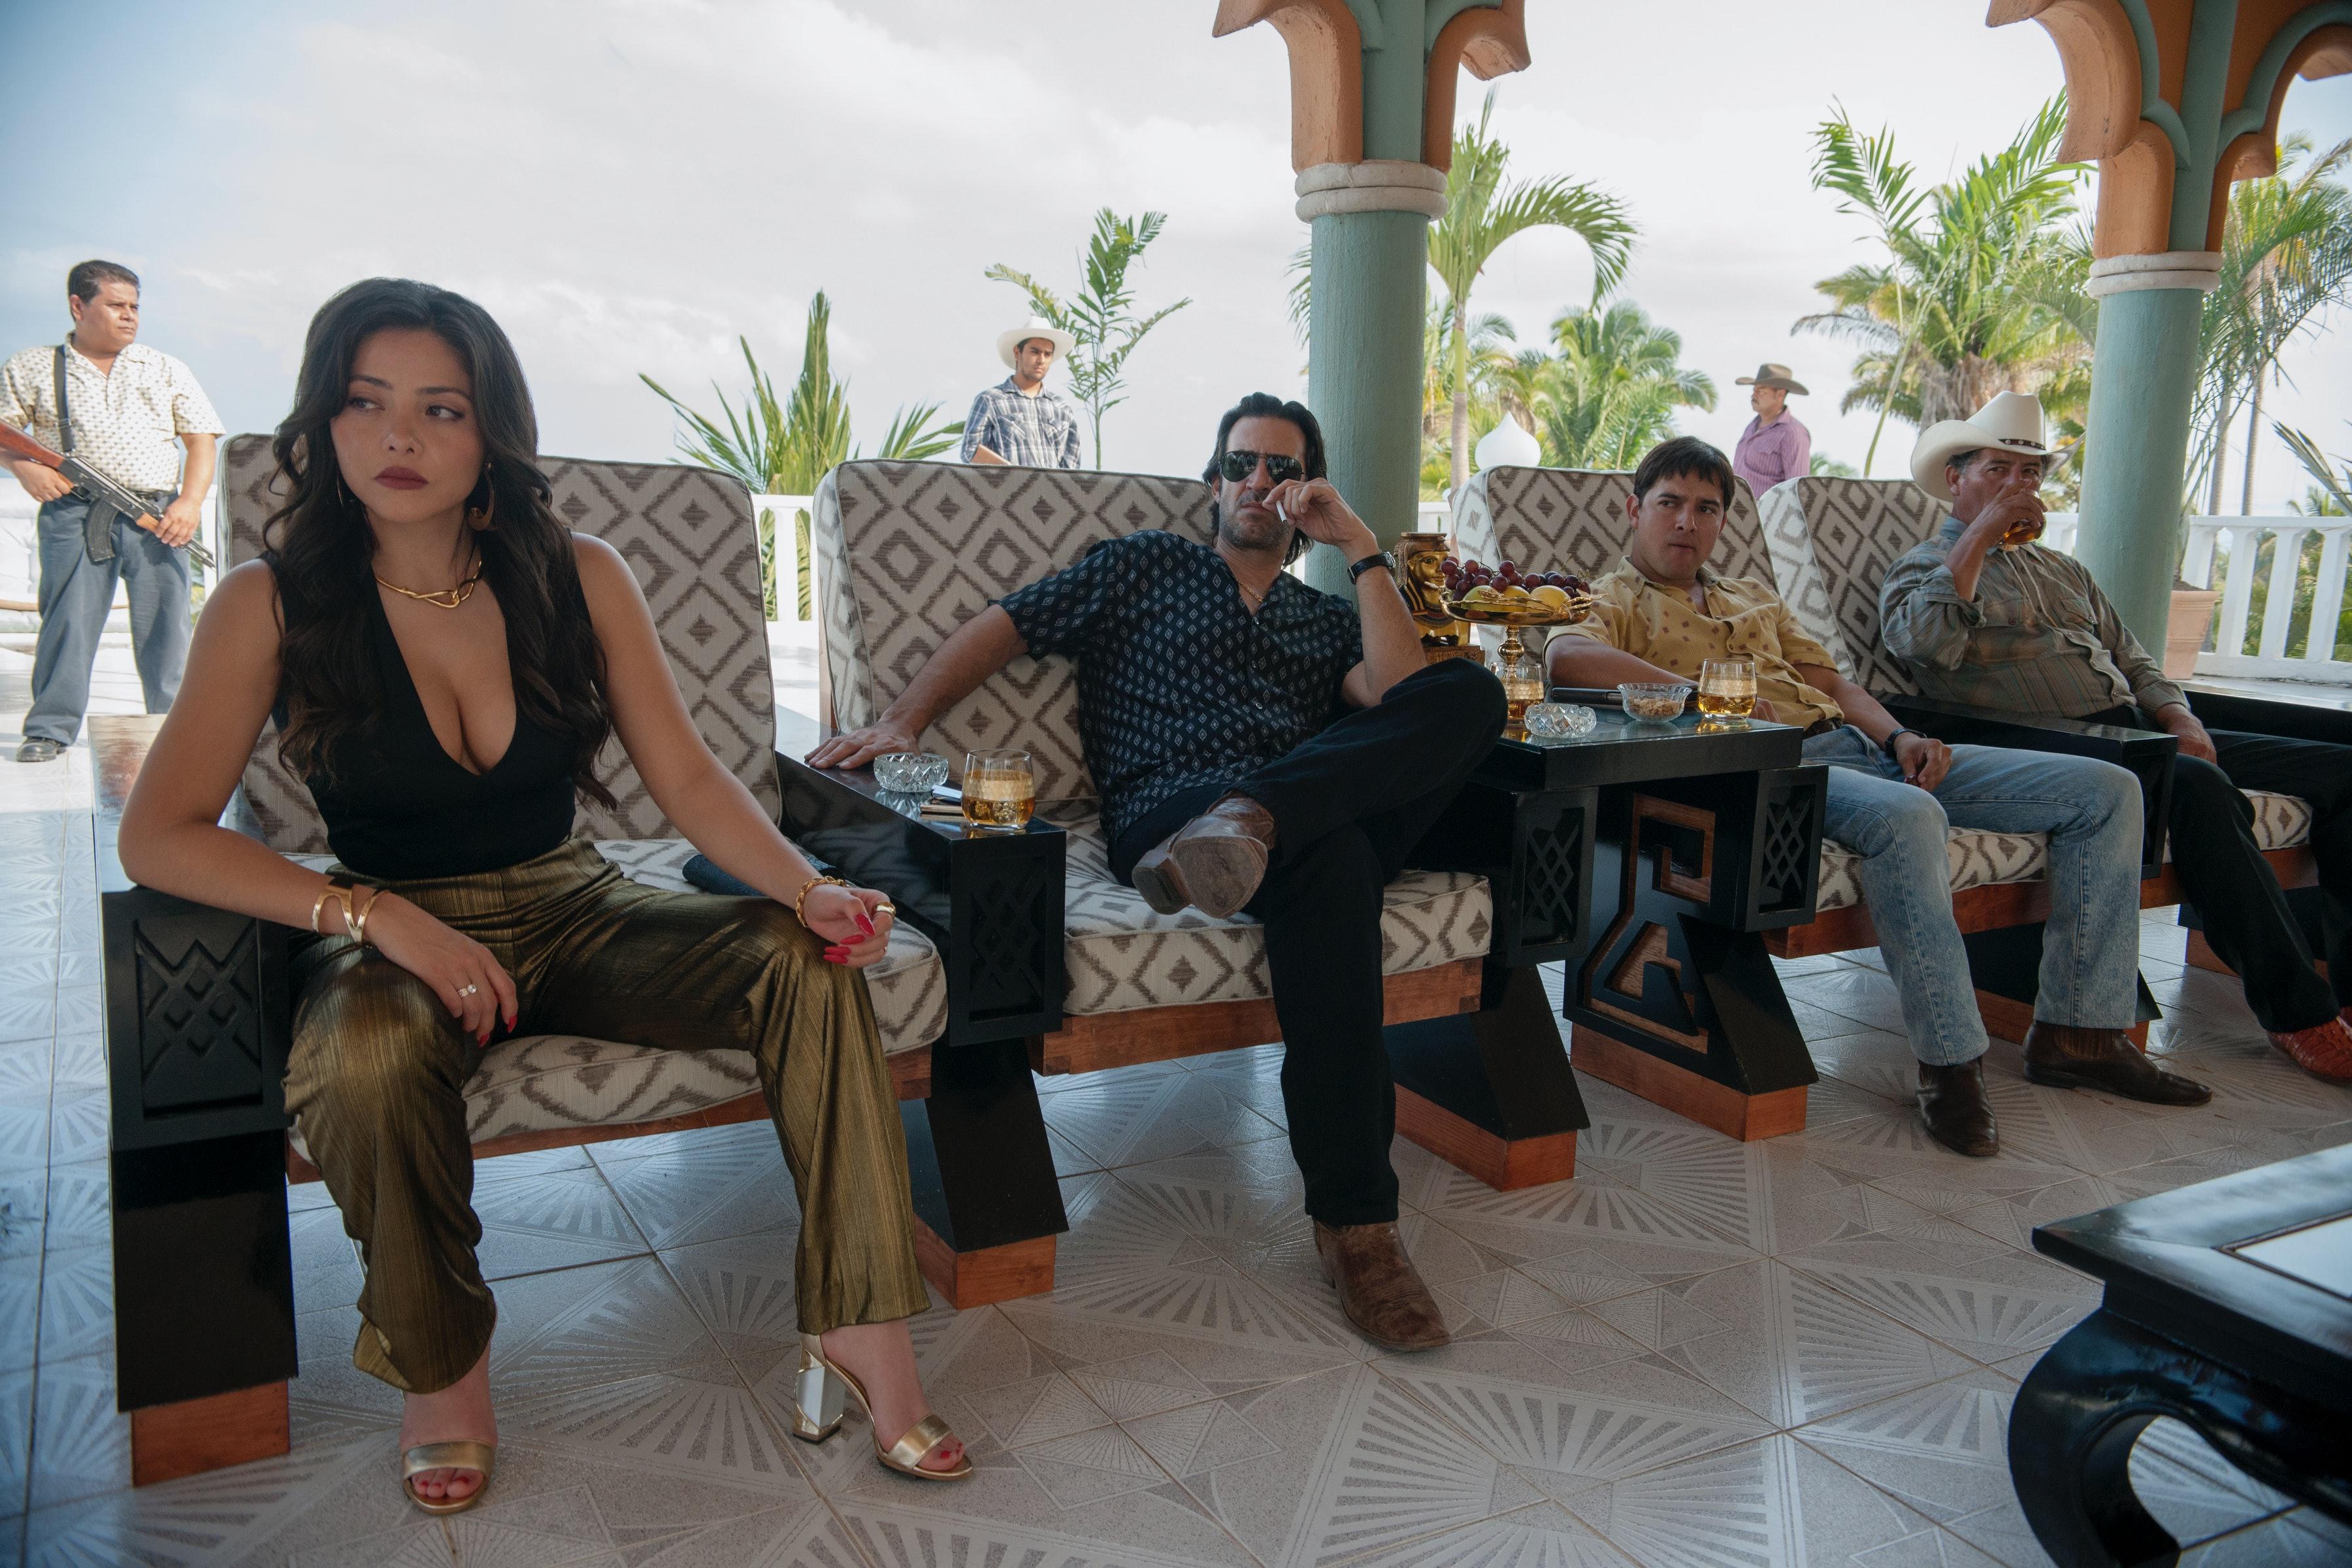 who plays el chapo in  u0026 39 narcos  mexico u0026 39   alejandro edda takes on the drug kingpin u0026 39 s early life